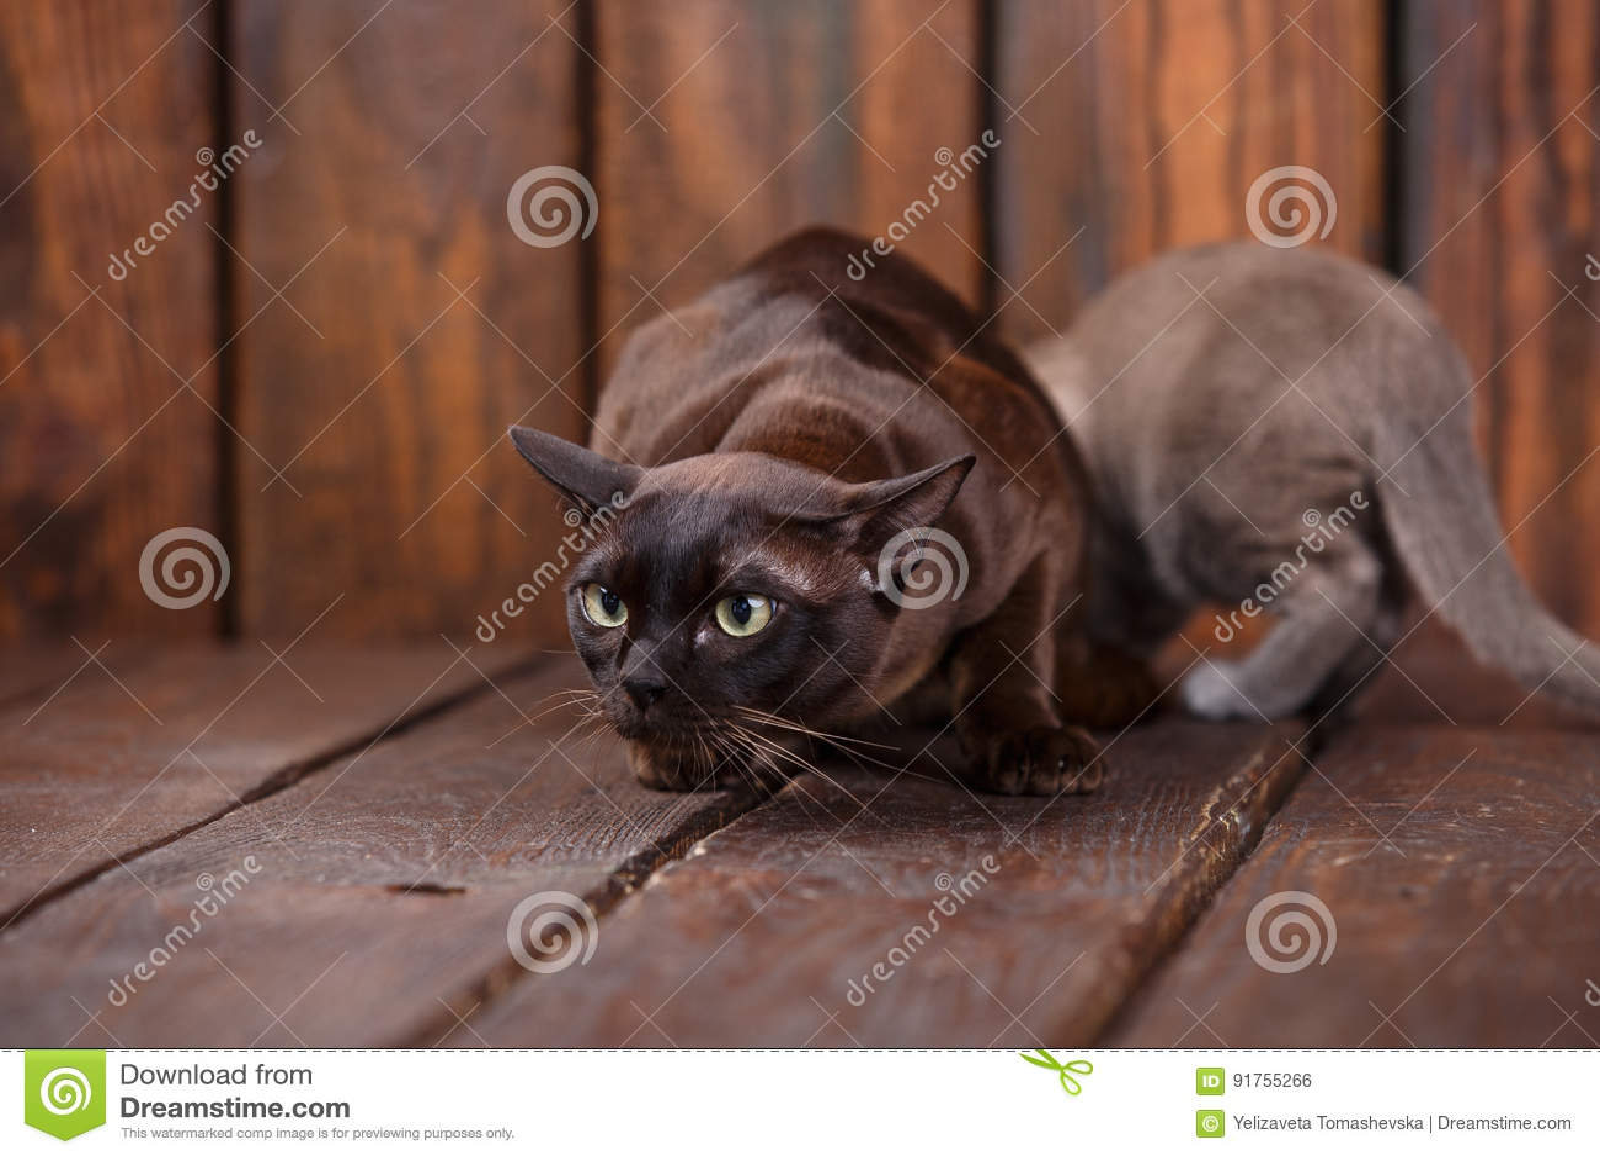 кот котенка и взрослого разводит европейских бирманца отца